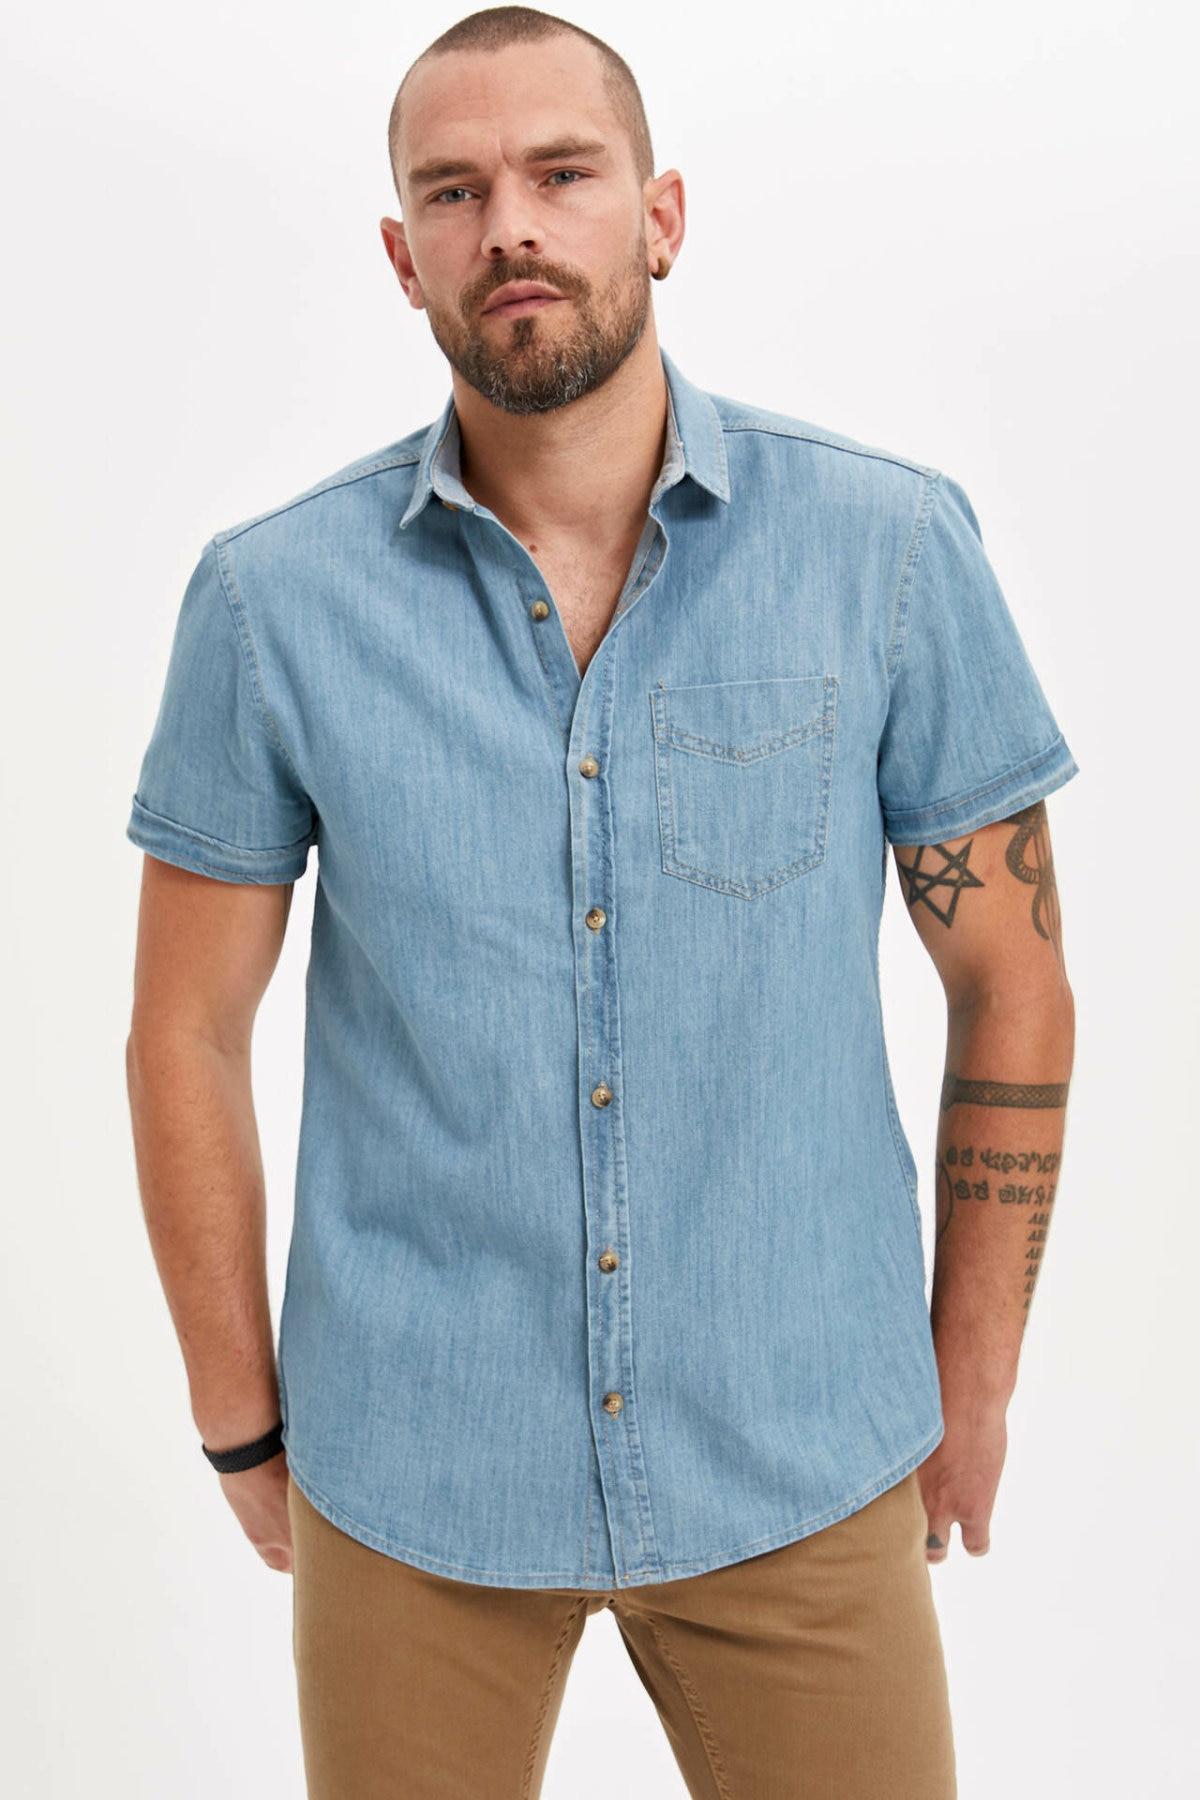 DeFacto Shirt Summer Men's Fashion Short Sleeve Blouser Male Casual Denim Comfort Shirts Men High Quality Tops New - L7440AZ19SM